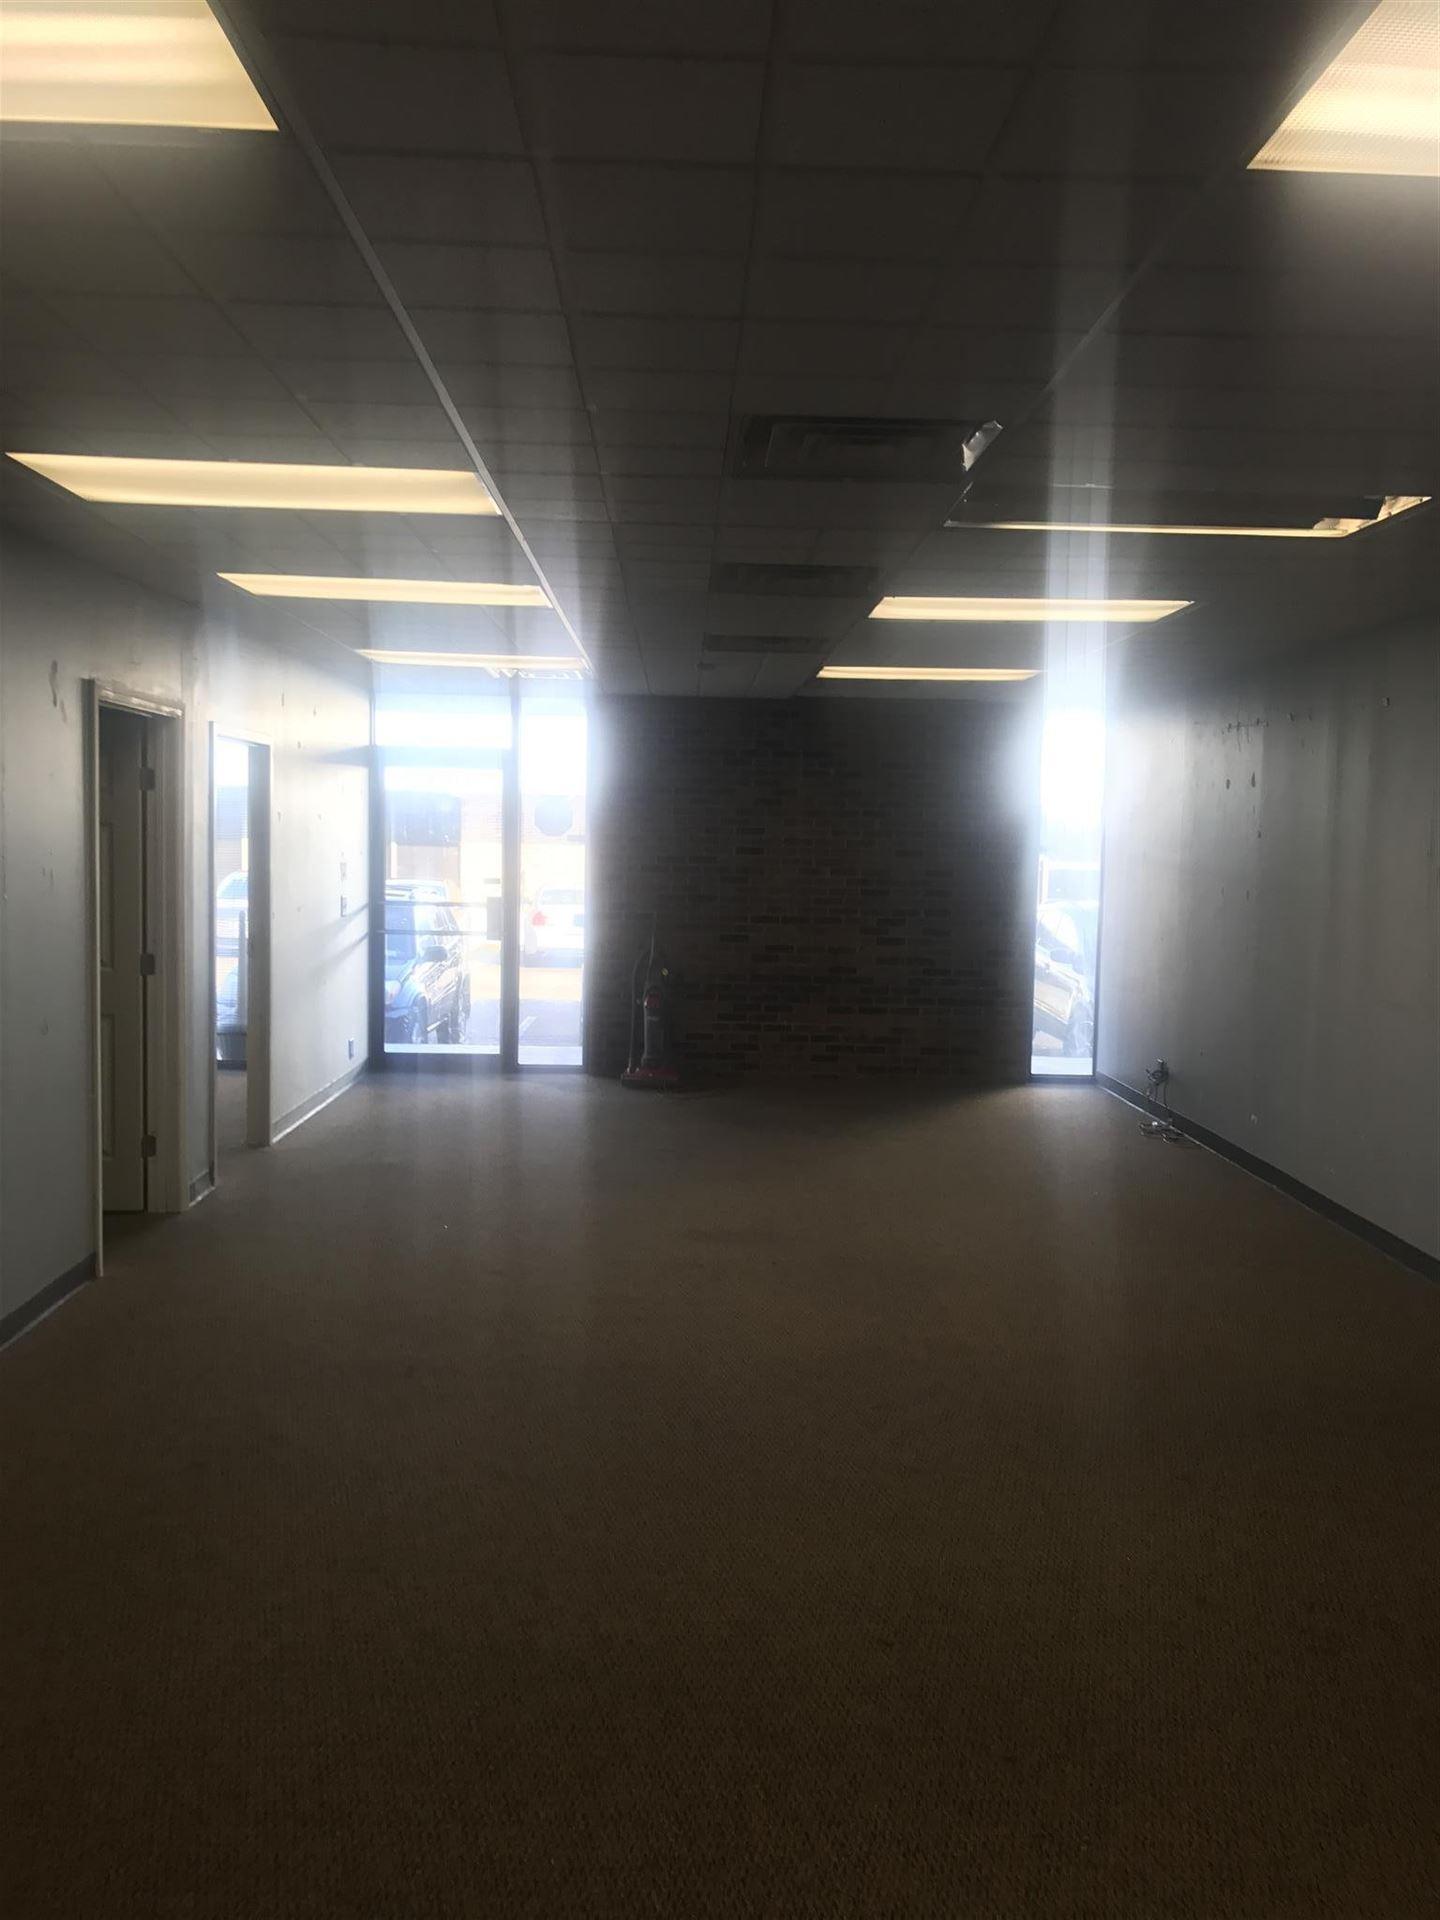 Photo of 907 Rivergate Pkwy E-4, Goodlettsville, TN 37072 (MLS # 2252465)